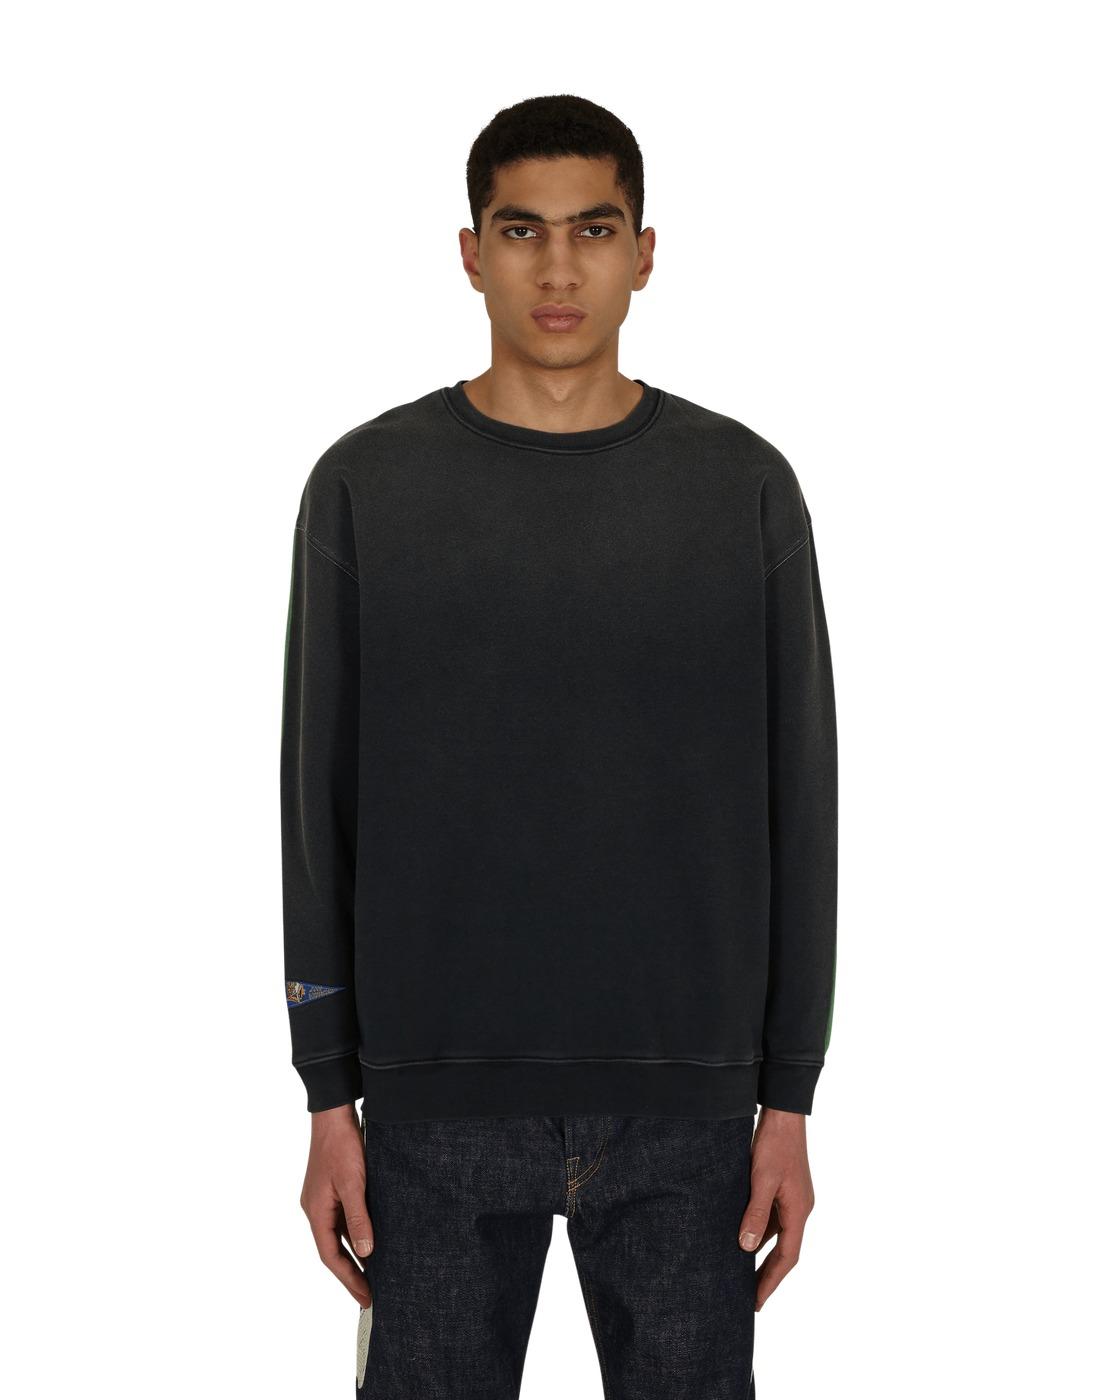 Kapital Fleece Knit 2 Tones Remake Big Crewneck Sweatshirt Blkxgreen